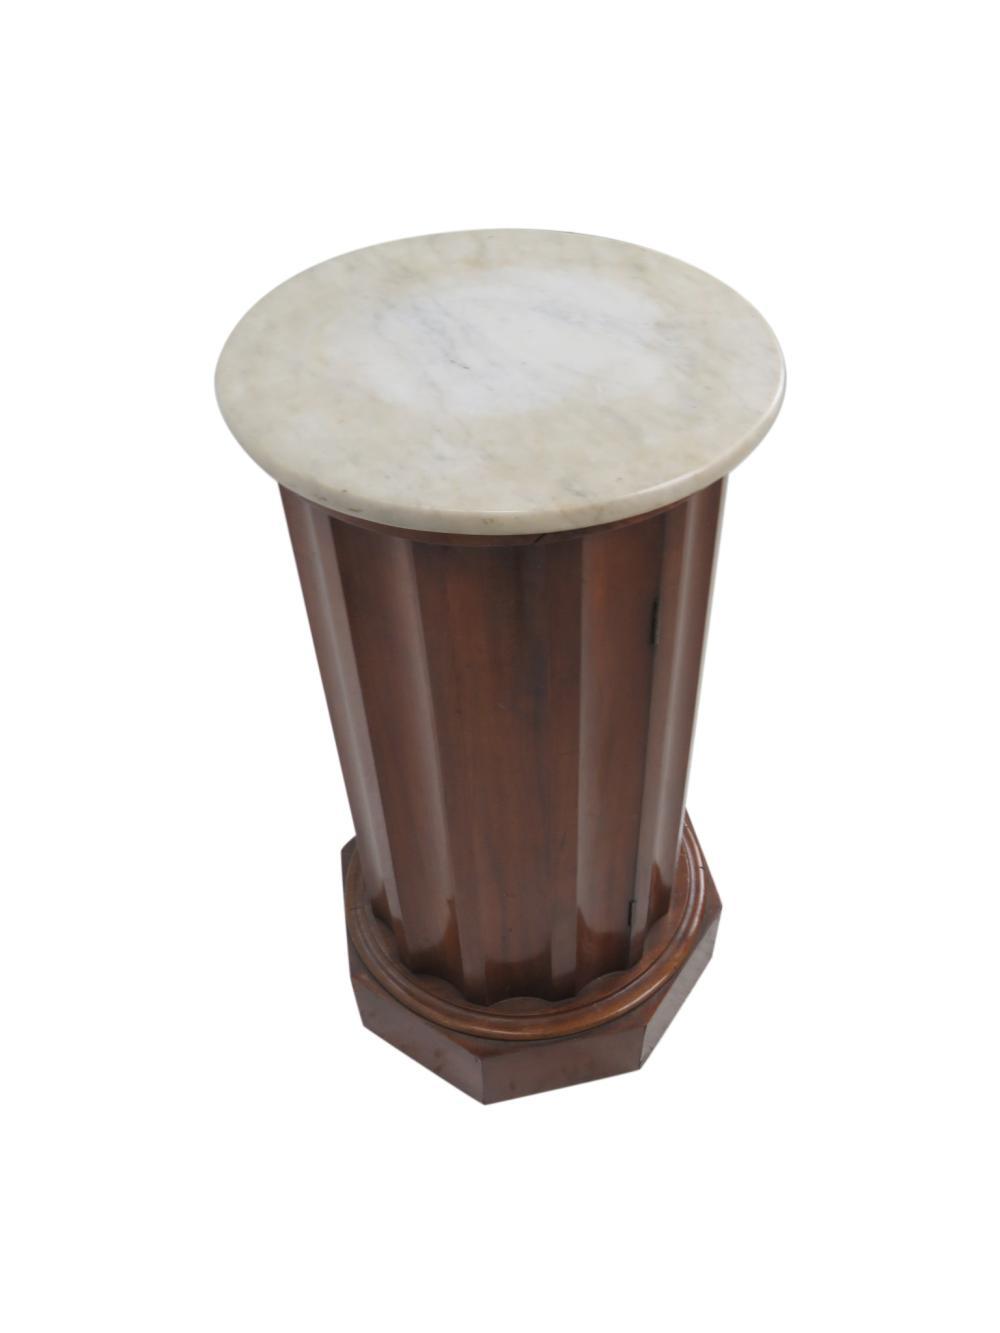 Marble Top Pedestal Cabinet